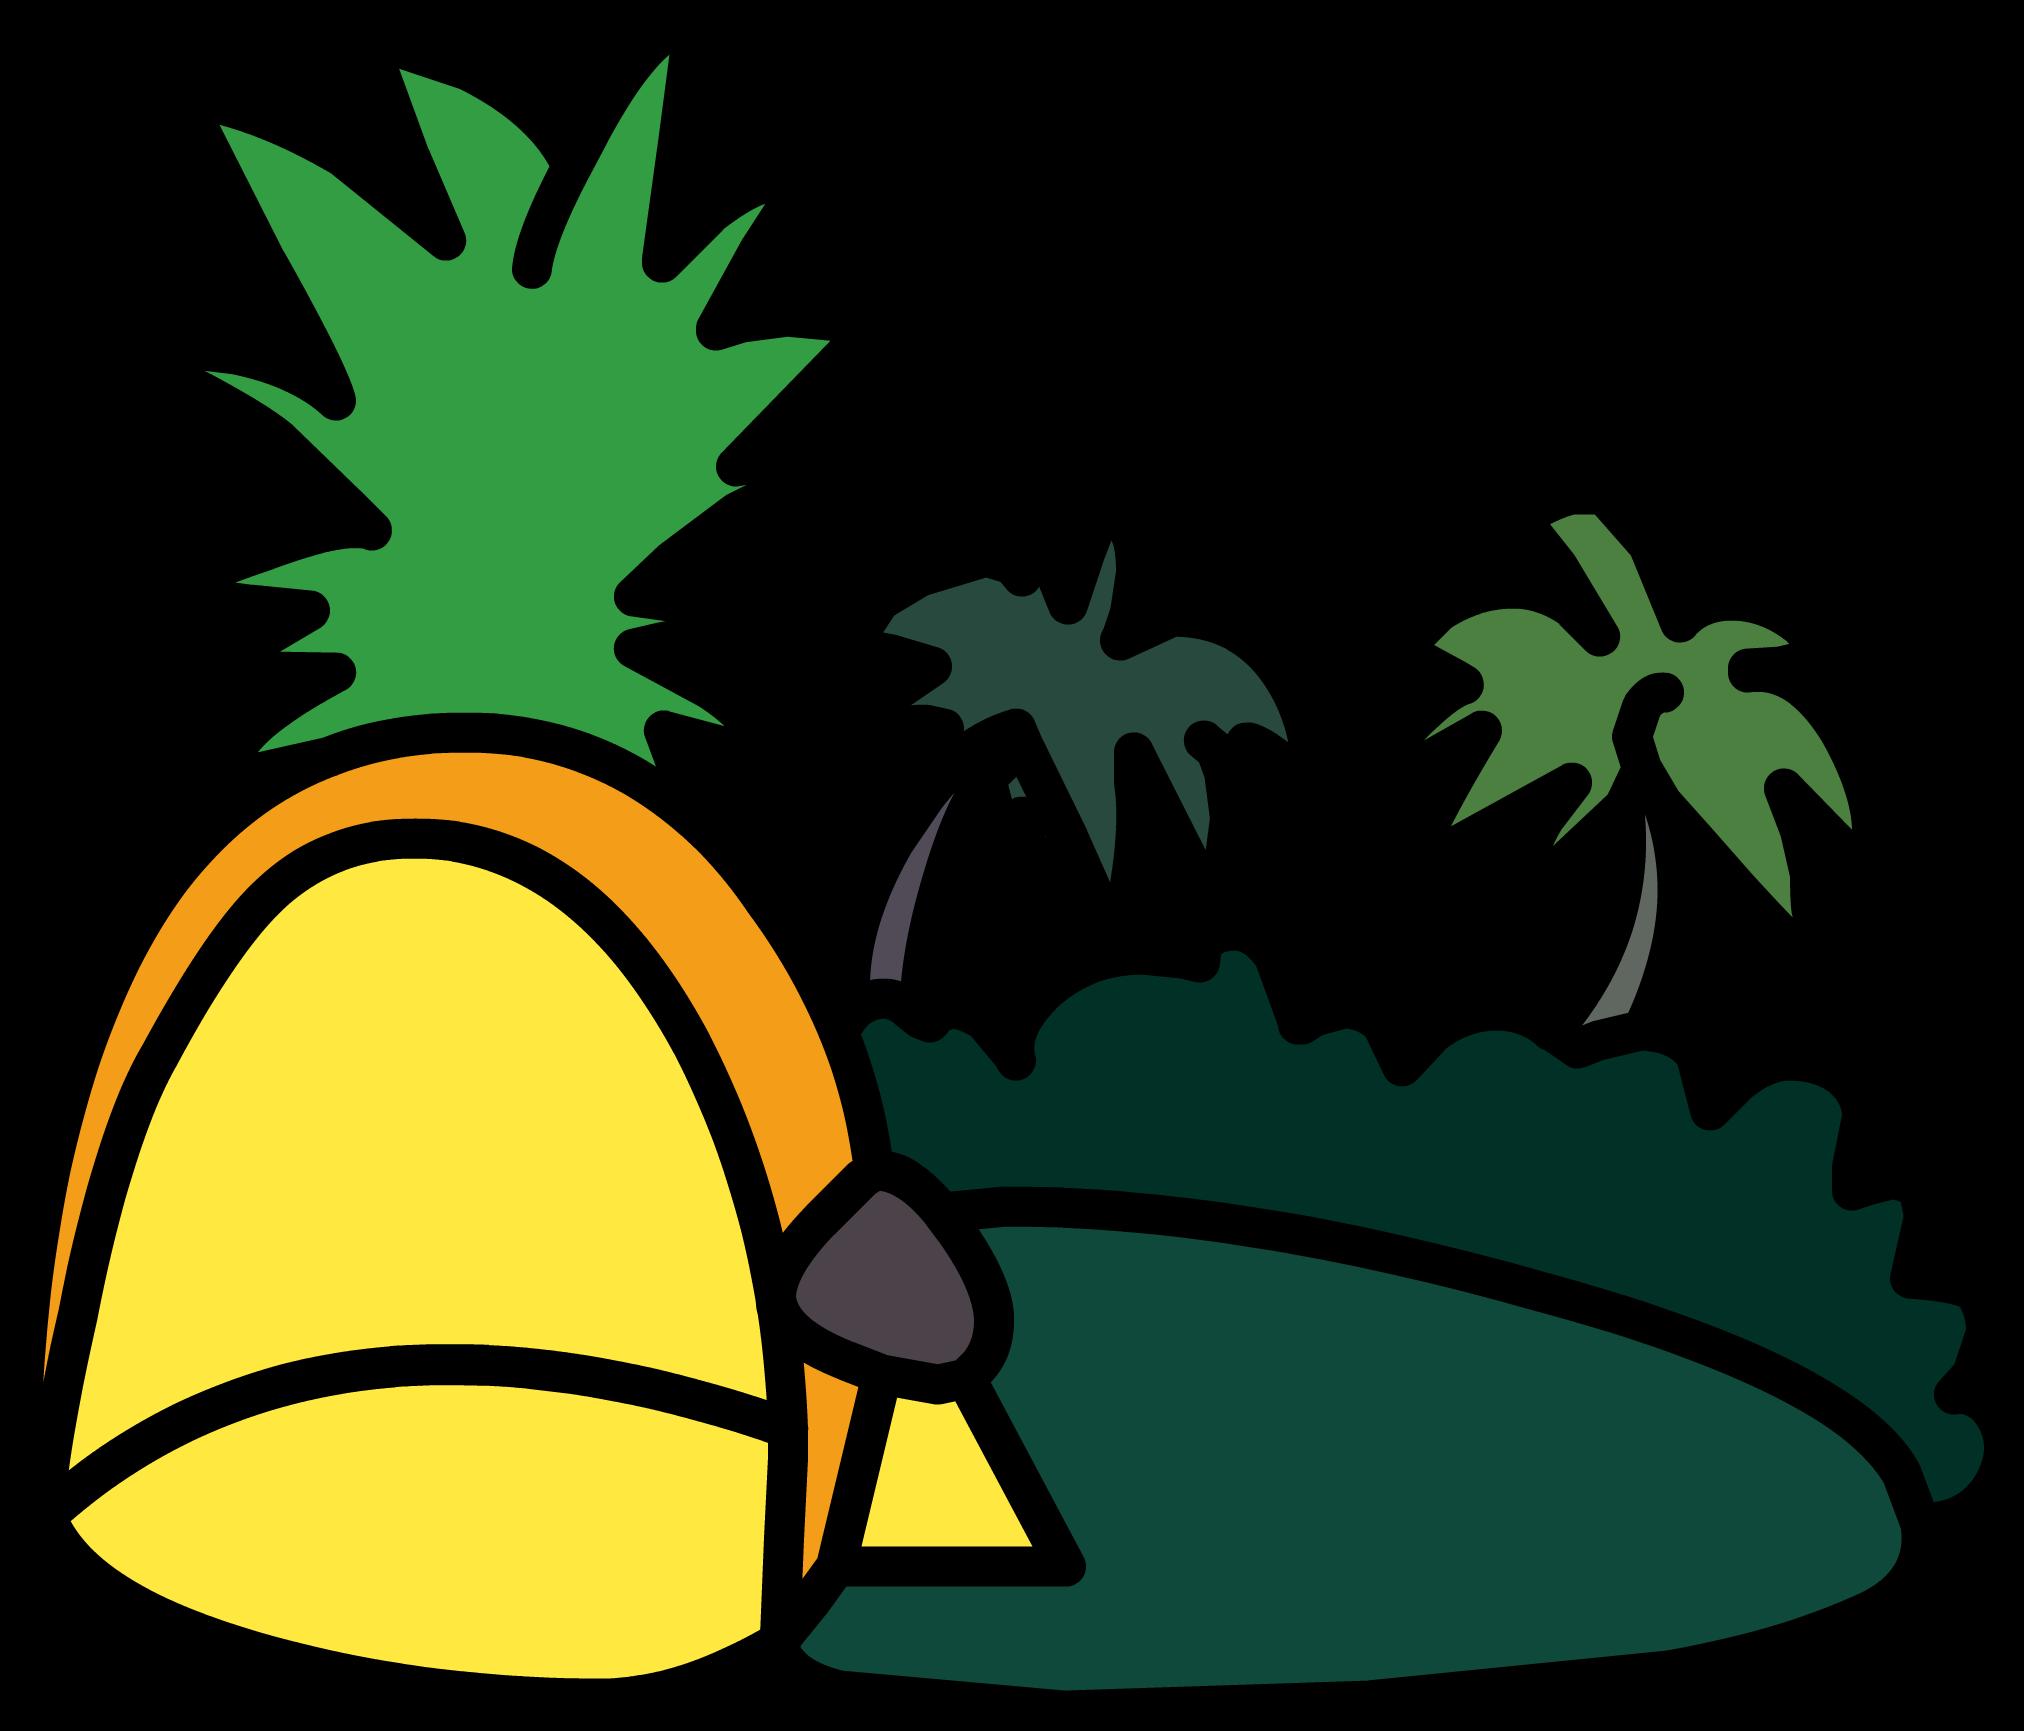 Igloo club penguin wiki. Pineapple clipart grey